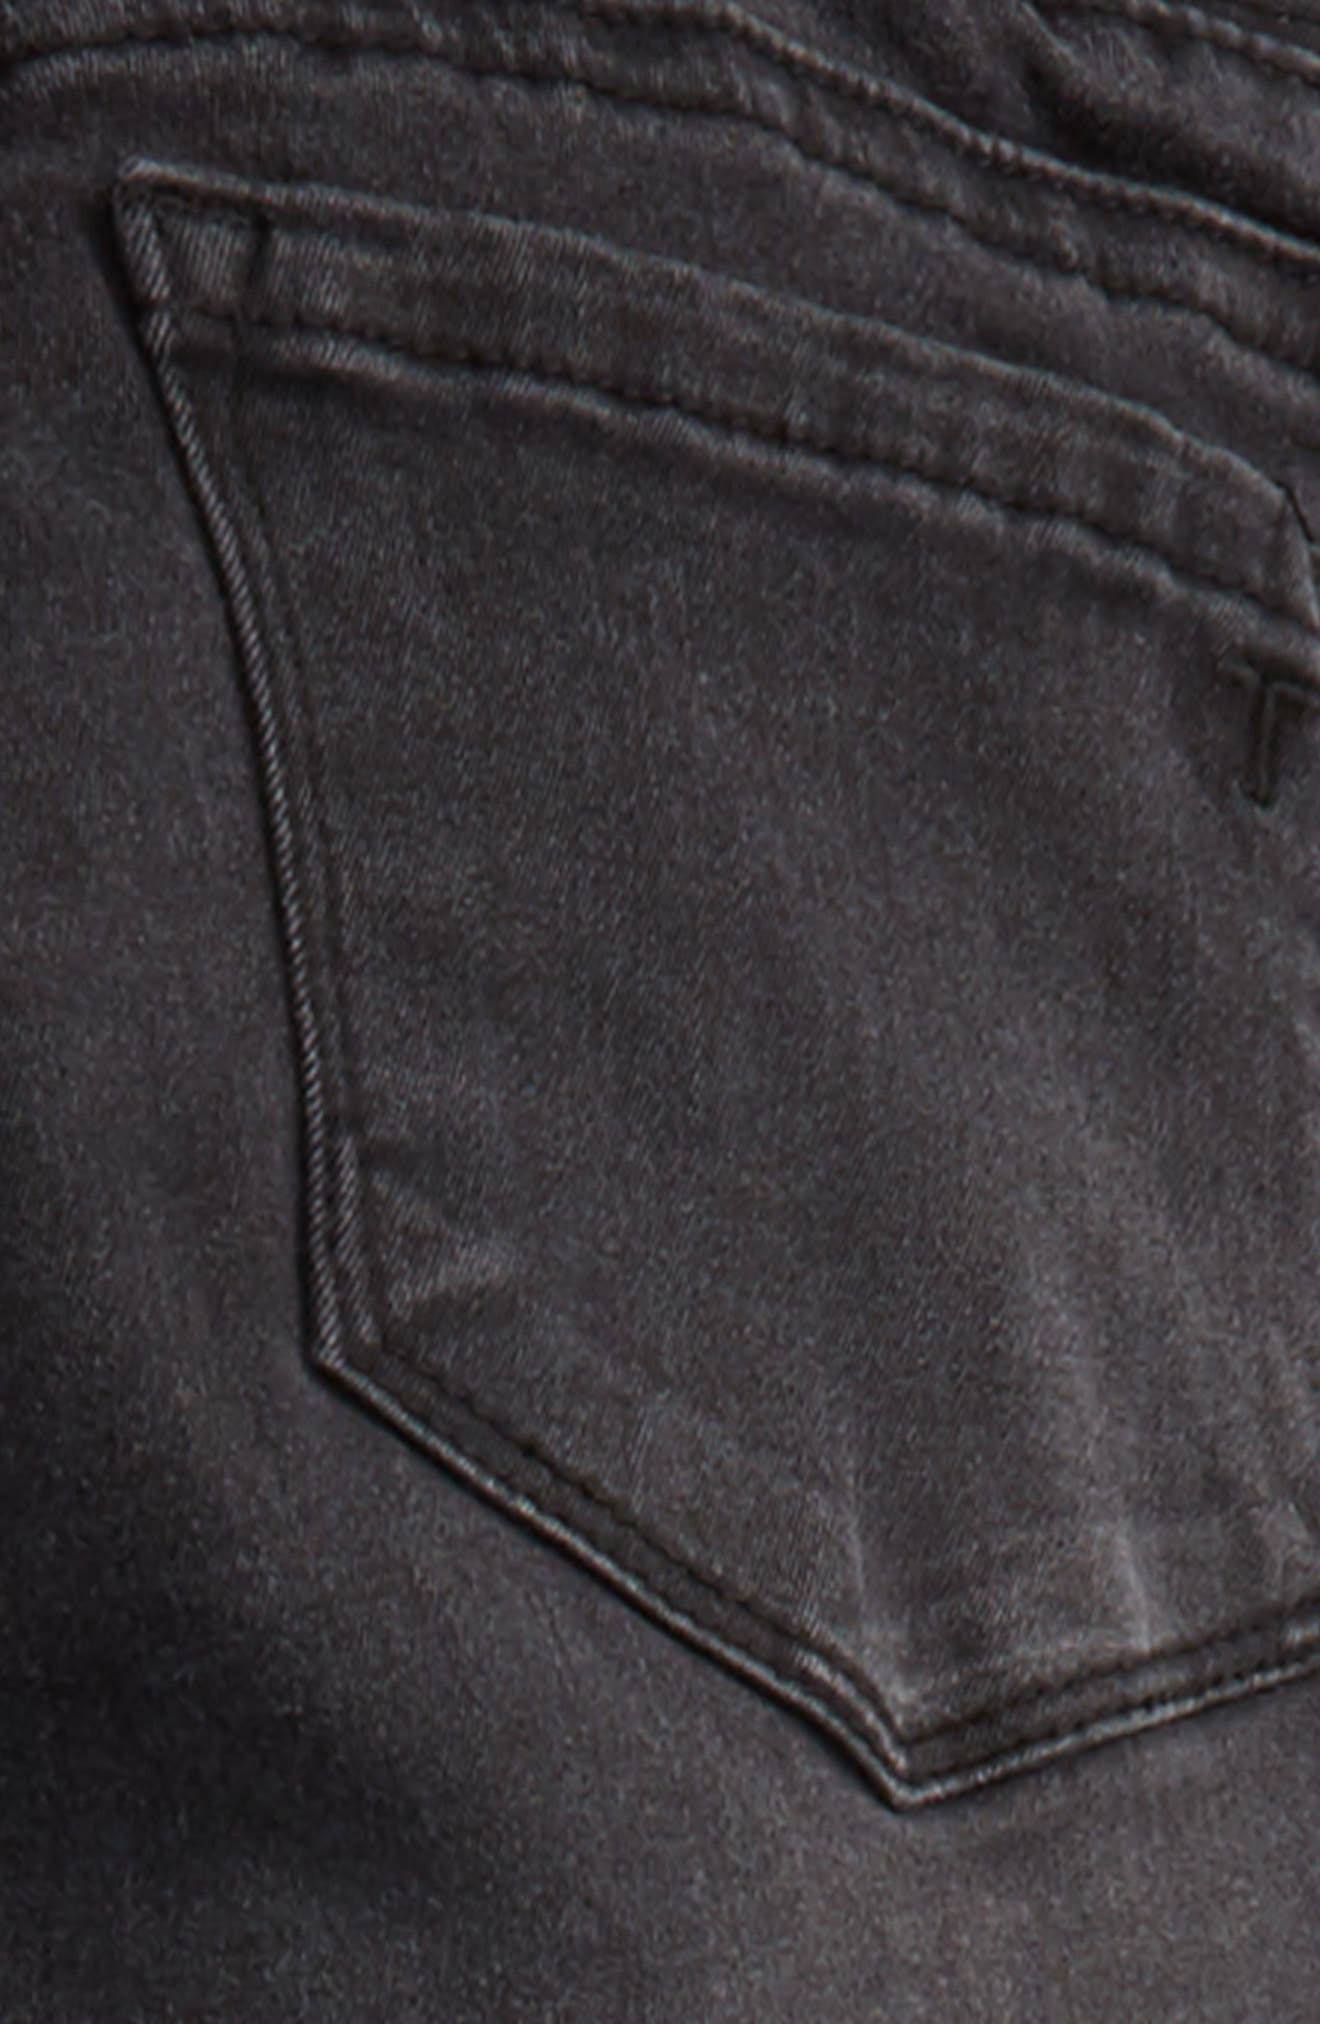 Frayed Denim Pants,                             Alternate thumbnail 3, color,                             001